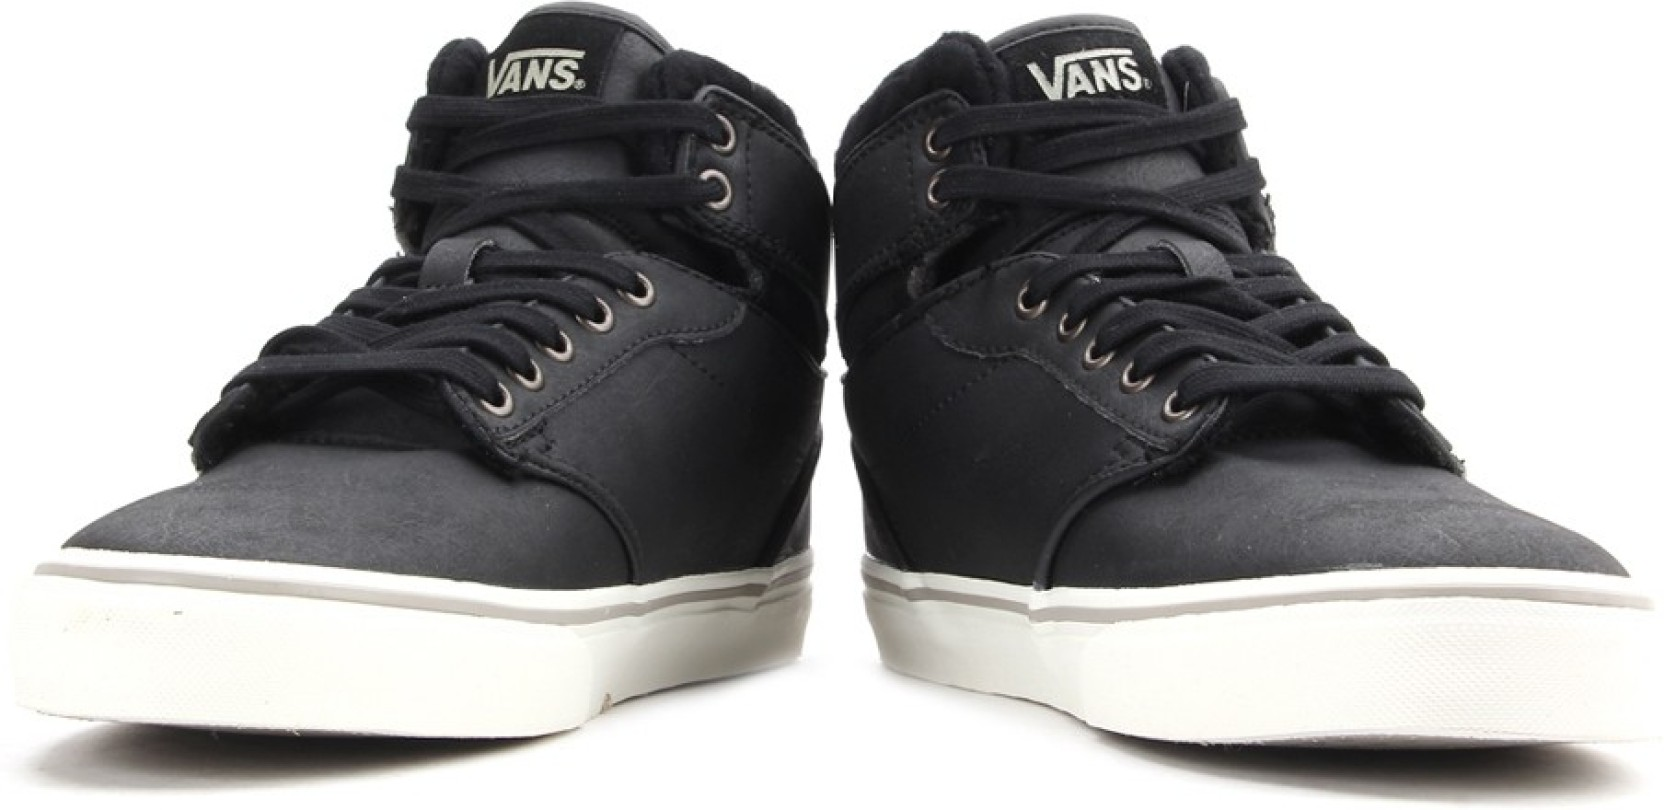 809c8fe443 Vans Atwood Hi Sneakers For Men - Buy (Leather) Black